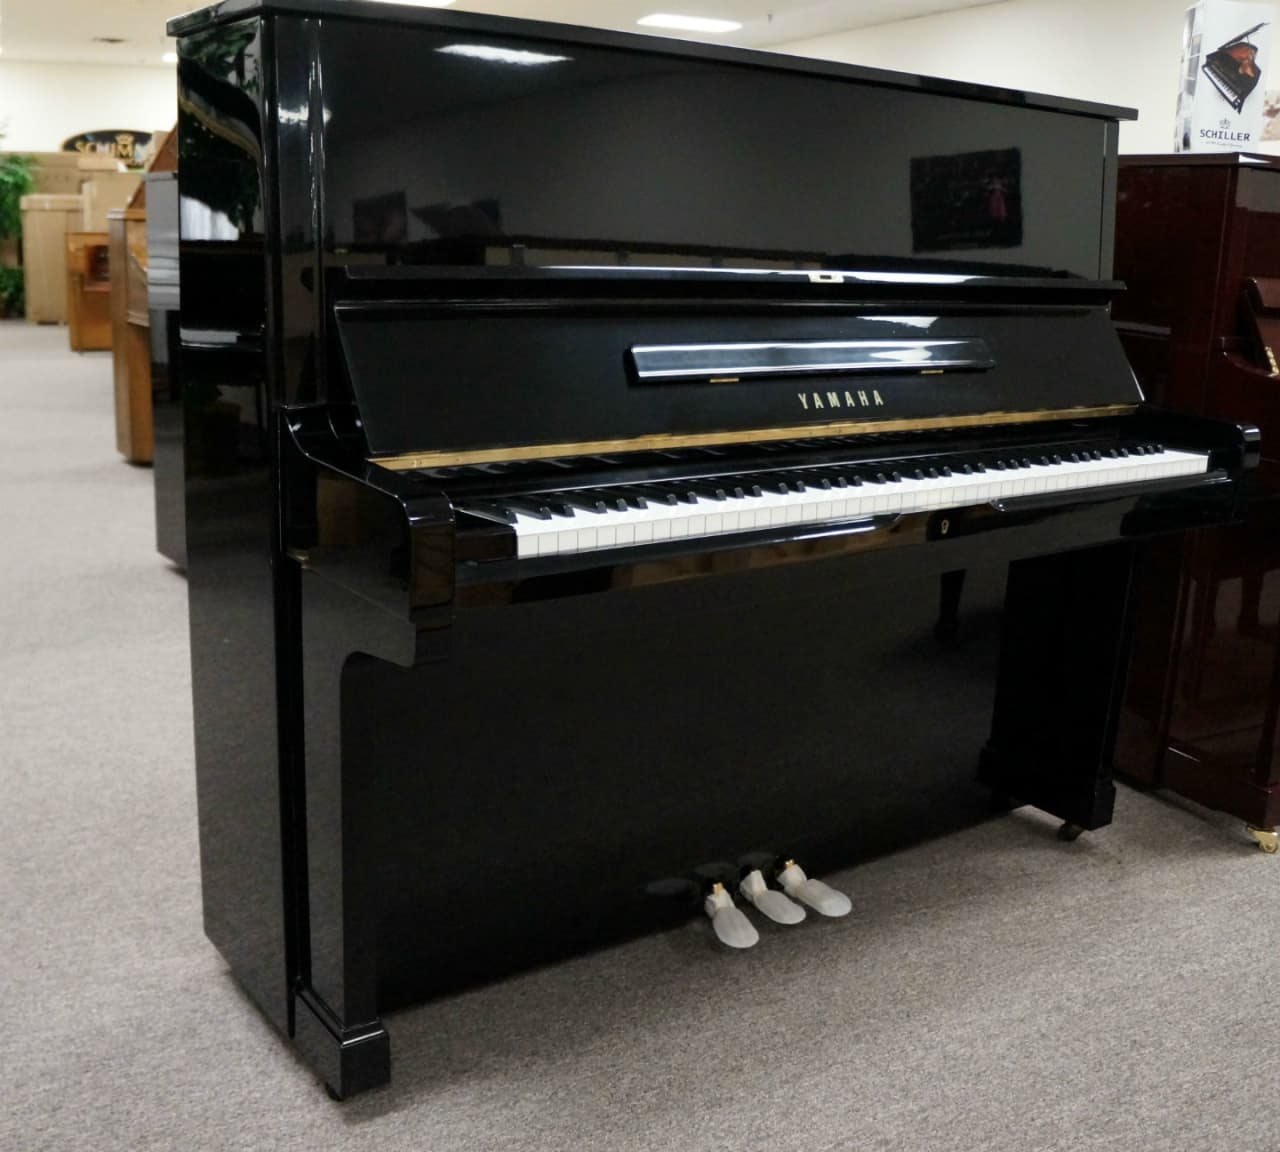 Yamaha u2 upright piano black polish reverb for Yamaha u2 piano